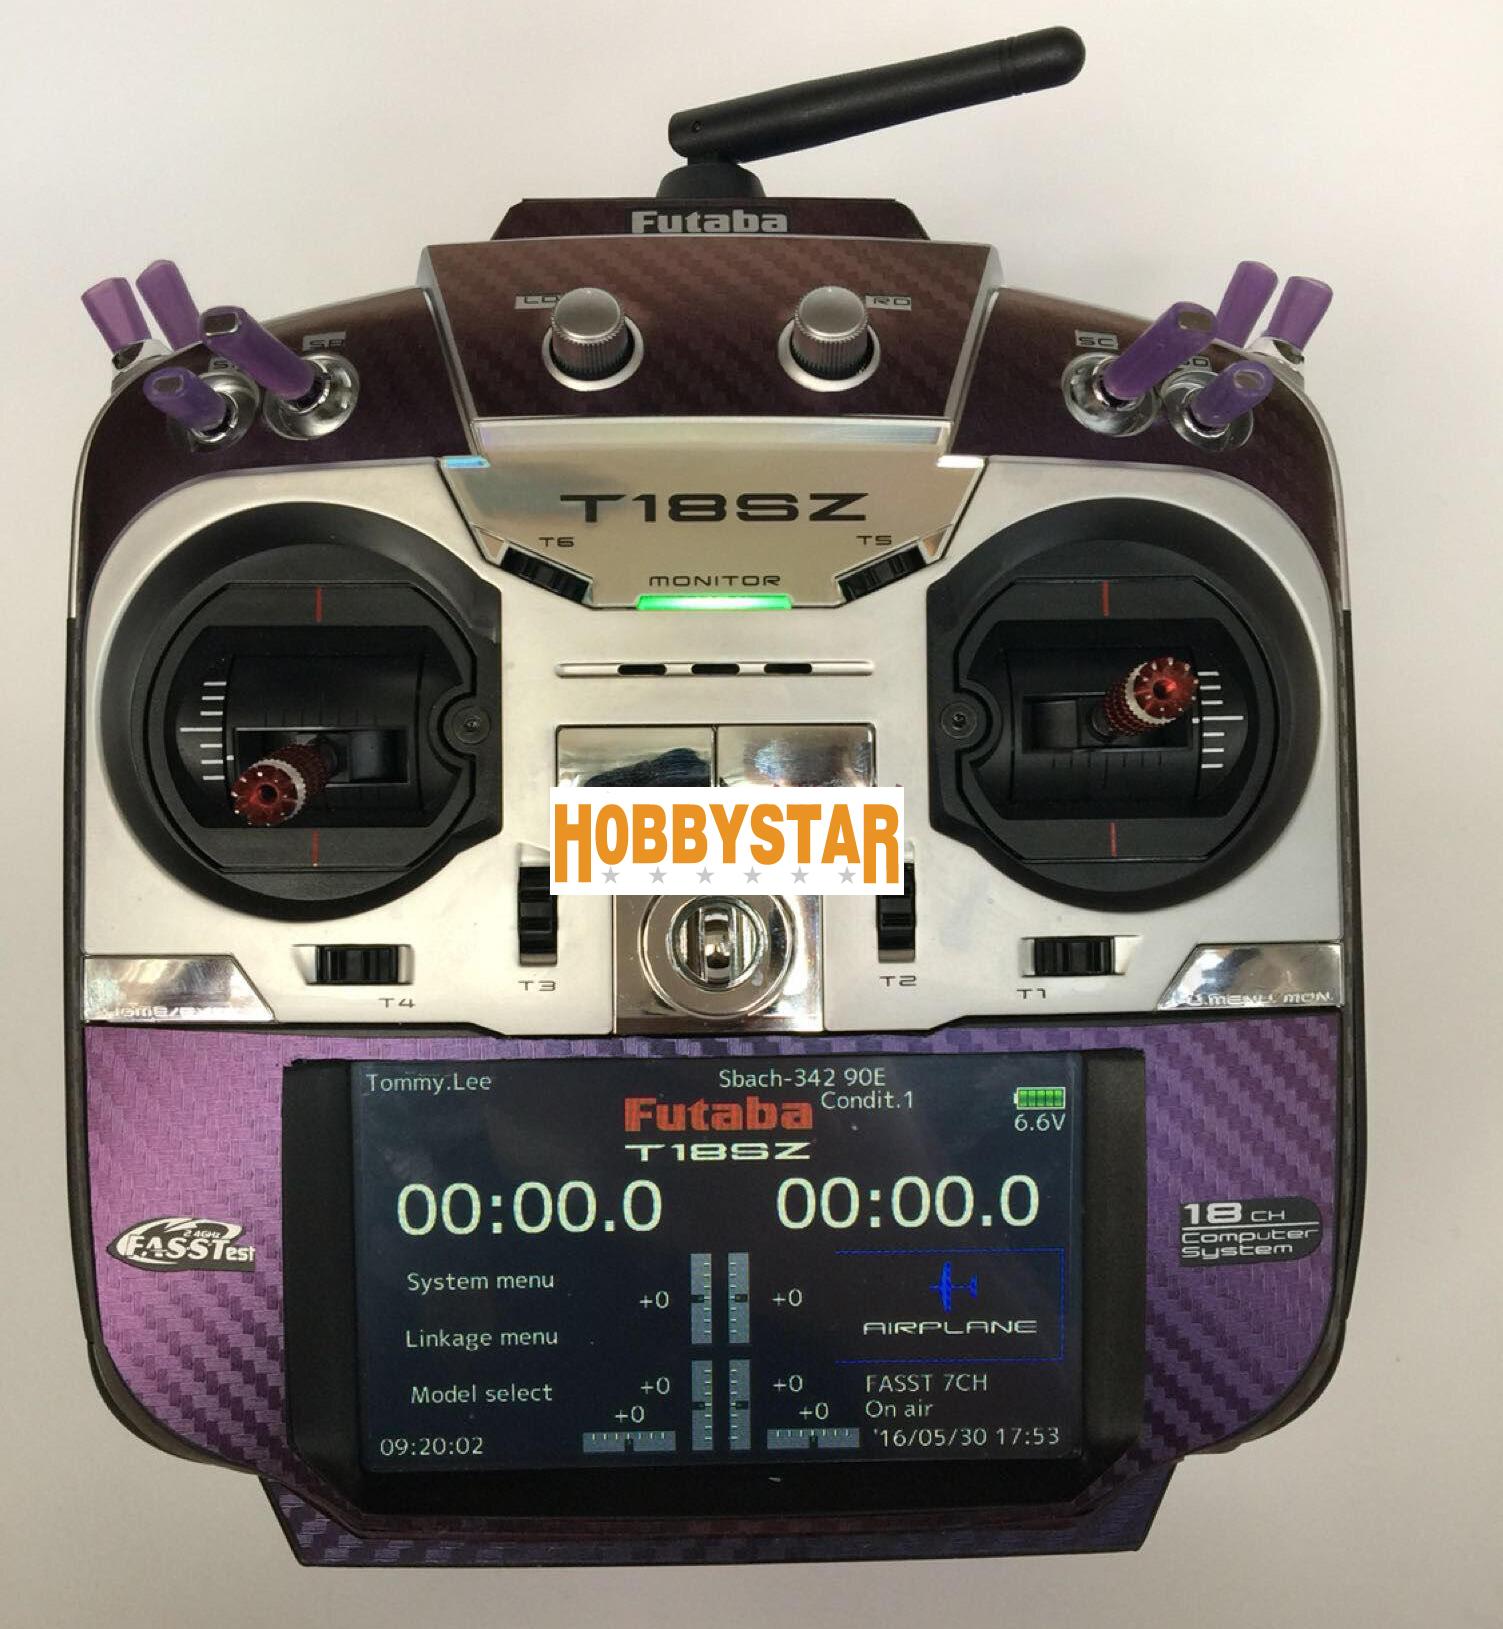 FUTABA 18SZ用 プロポスキン カーボン調 変色カメレオン ブルー⇒バイオレット (送料無料)